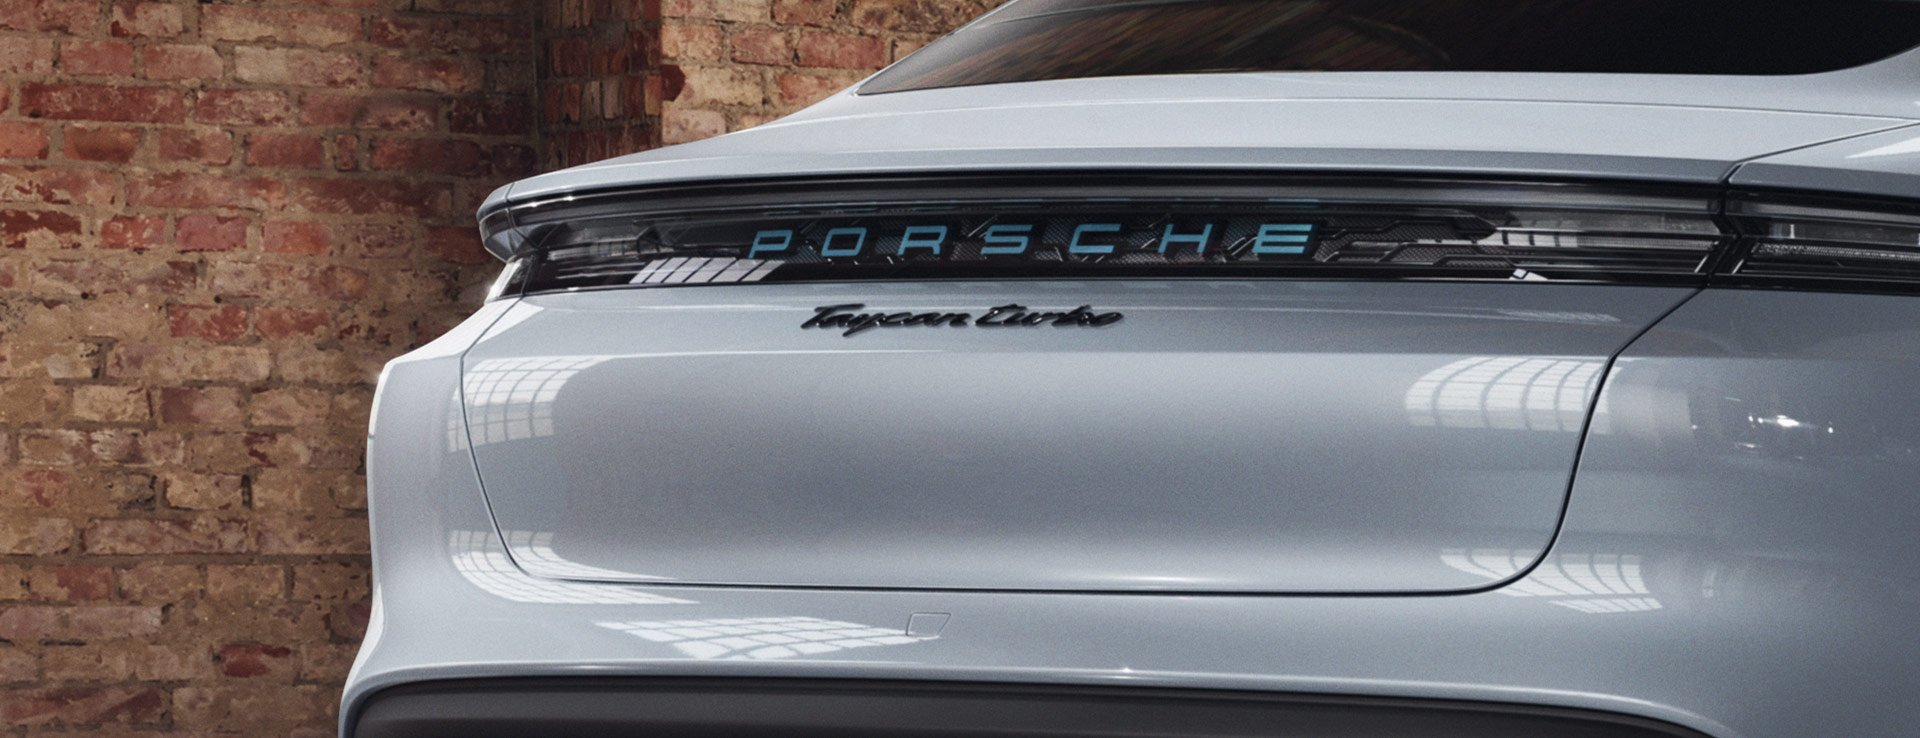 Porsche-Exclusive-Taycan-Turbo-14